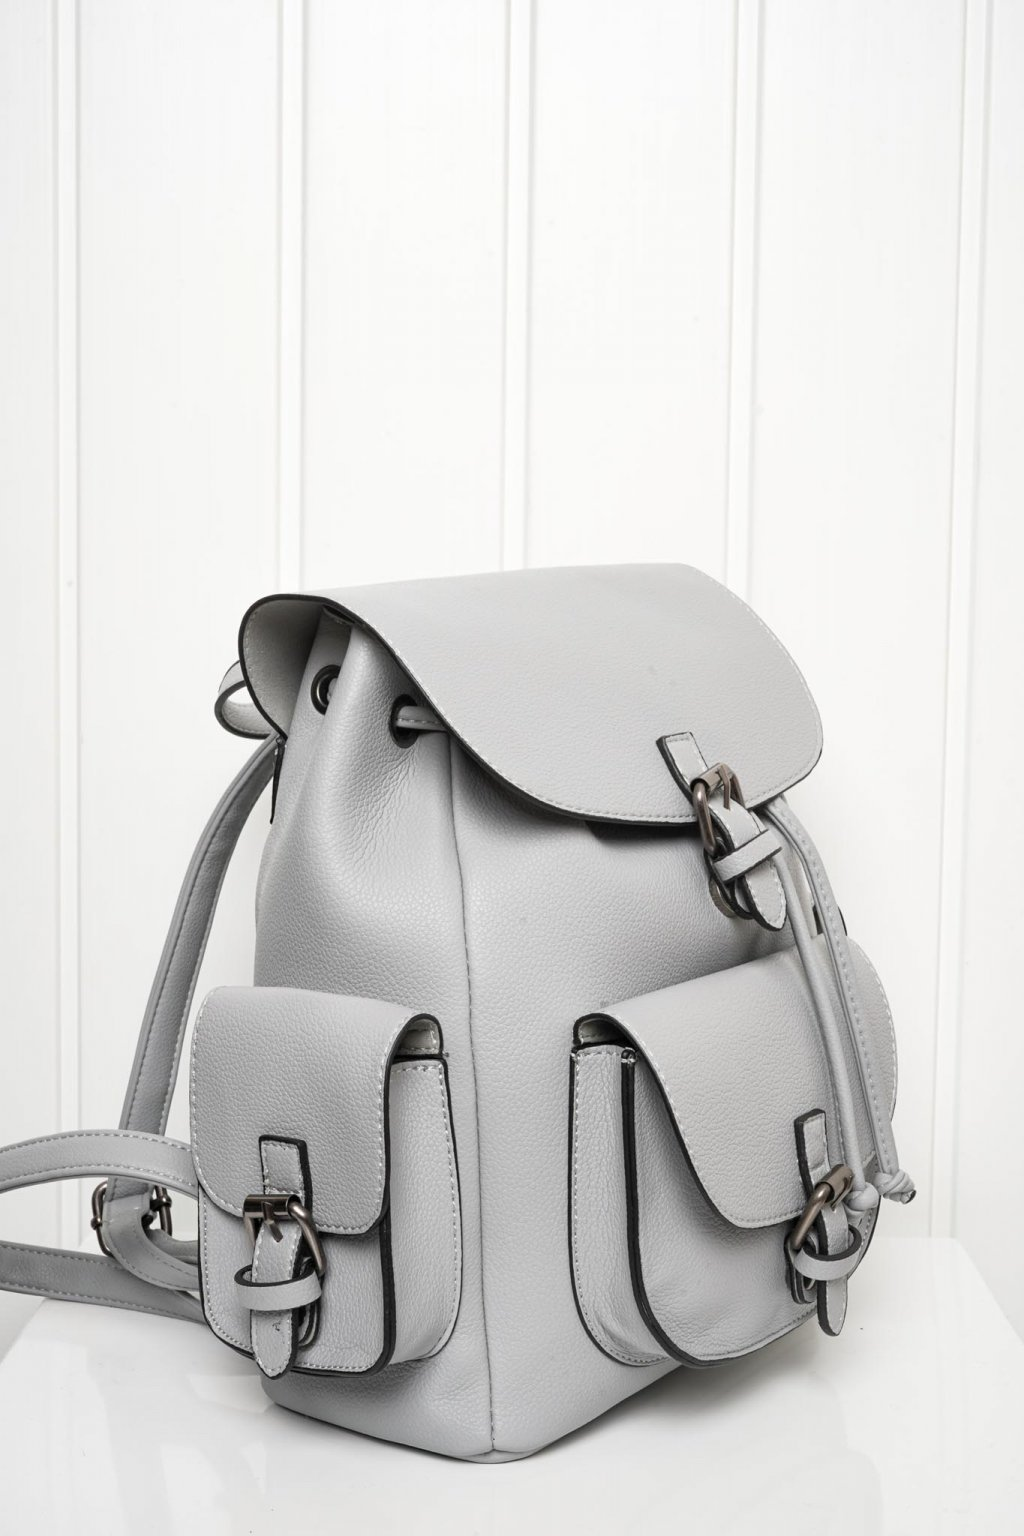 Kabelka, crossbody, ruksak, shopping bag, shopperka, 383